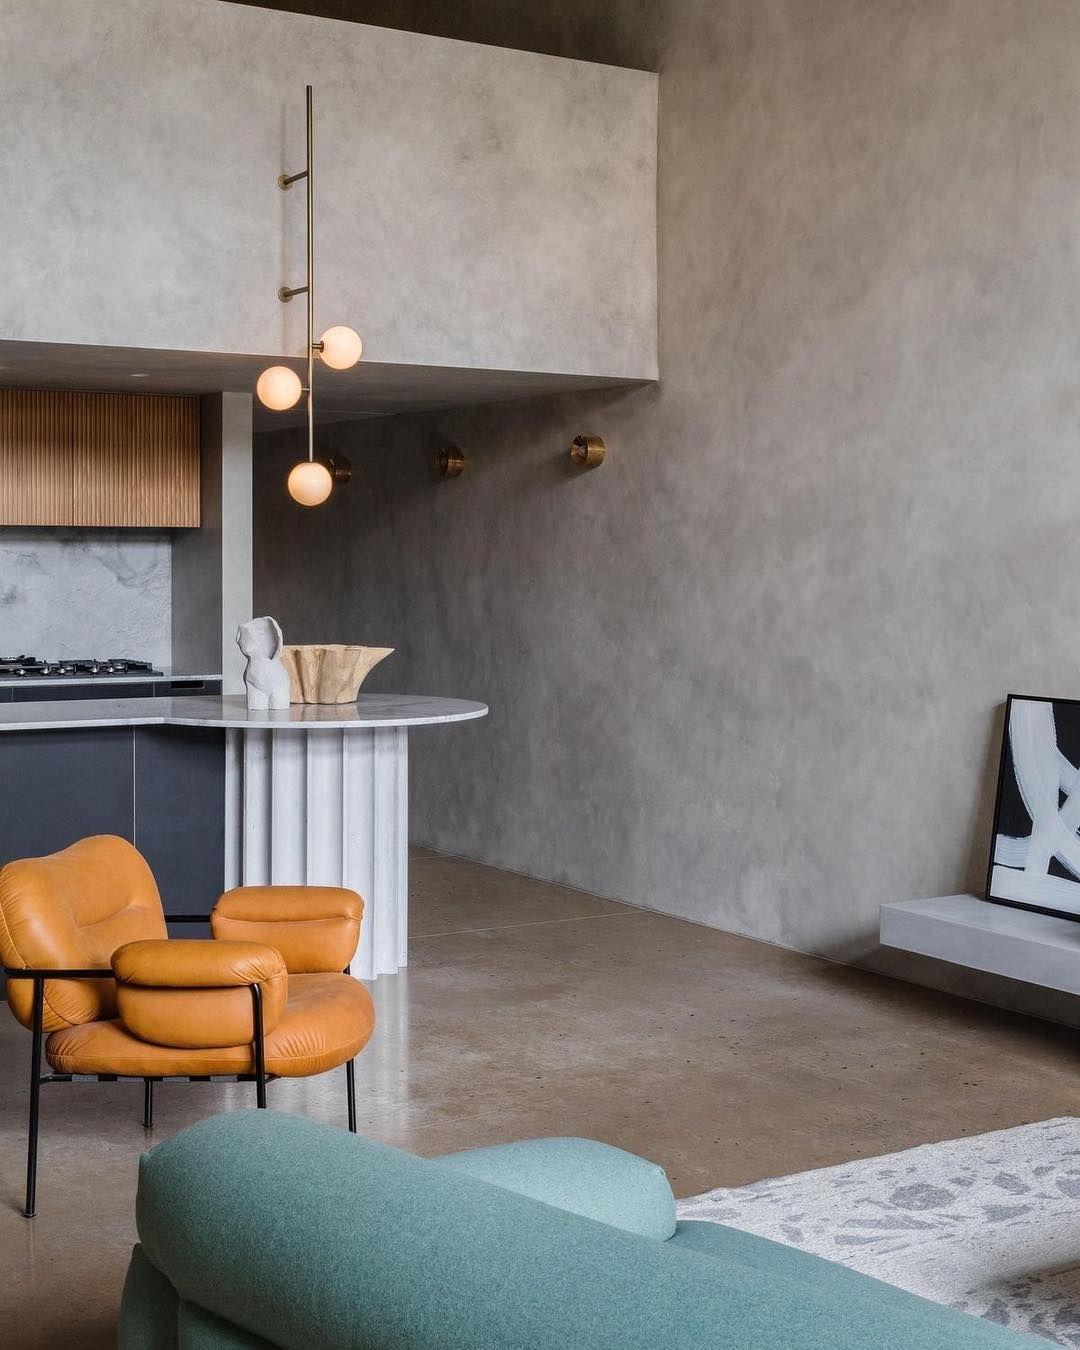 New The 10 Best Home Decor With Pictures Ideas Instagram Interiordesign Interior Homedesign Design Colo Interior Architecture Design Stylish Loft